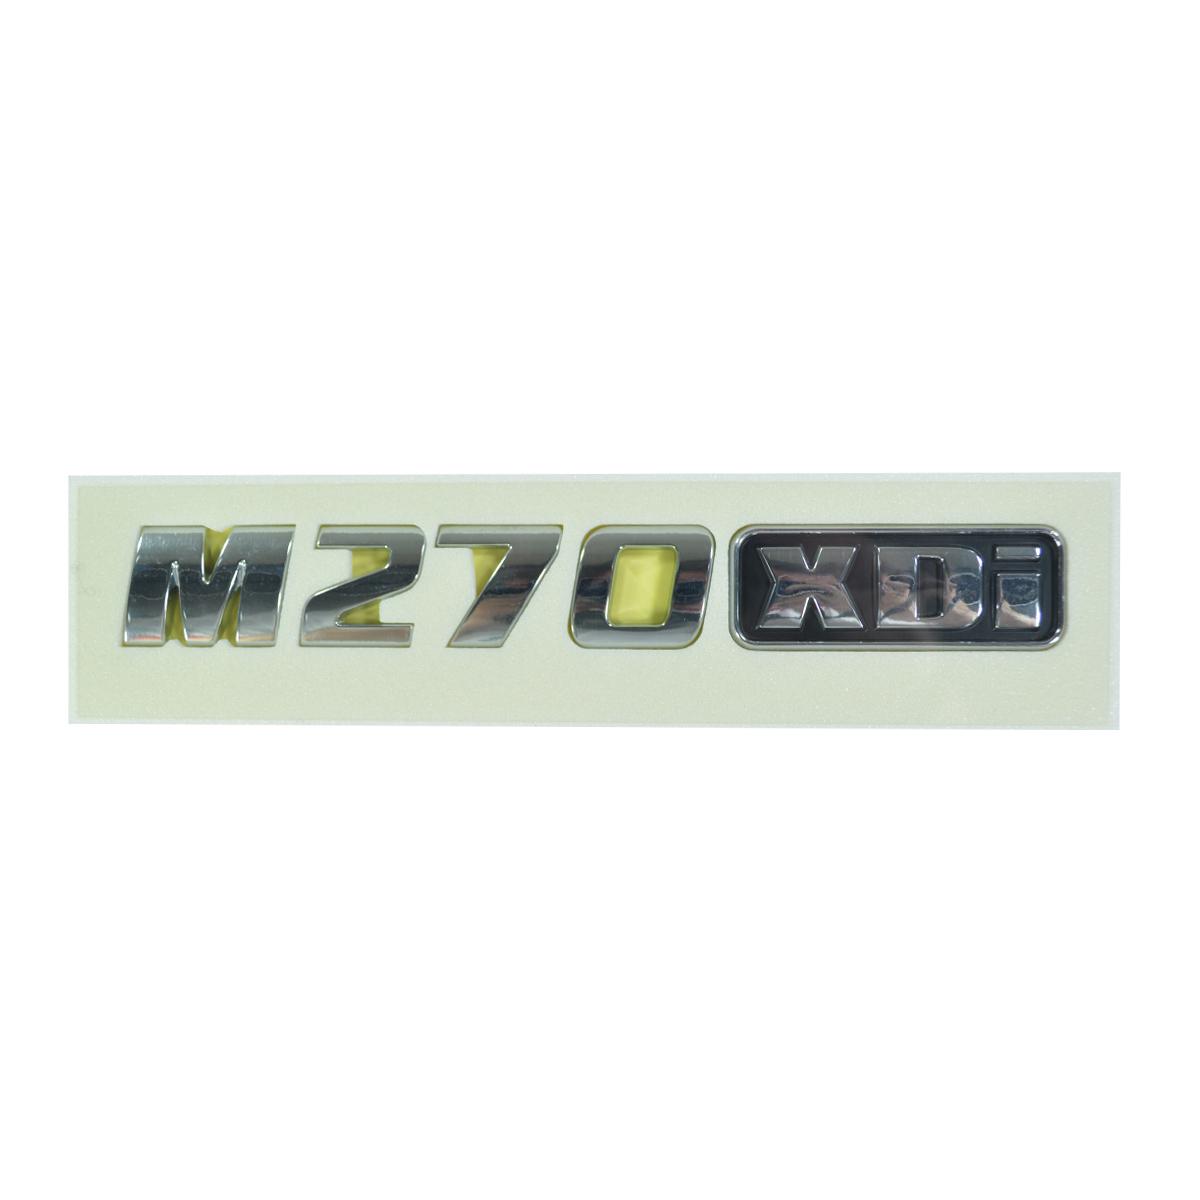 Emblema Porta Dianteira M270XDI Ssangyong Kyron 2.7 após 2008 Original